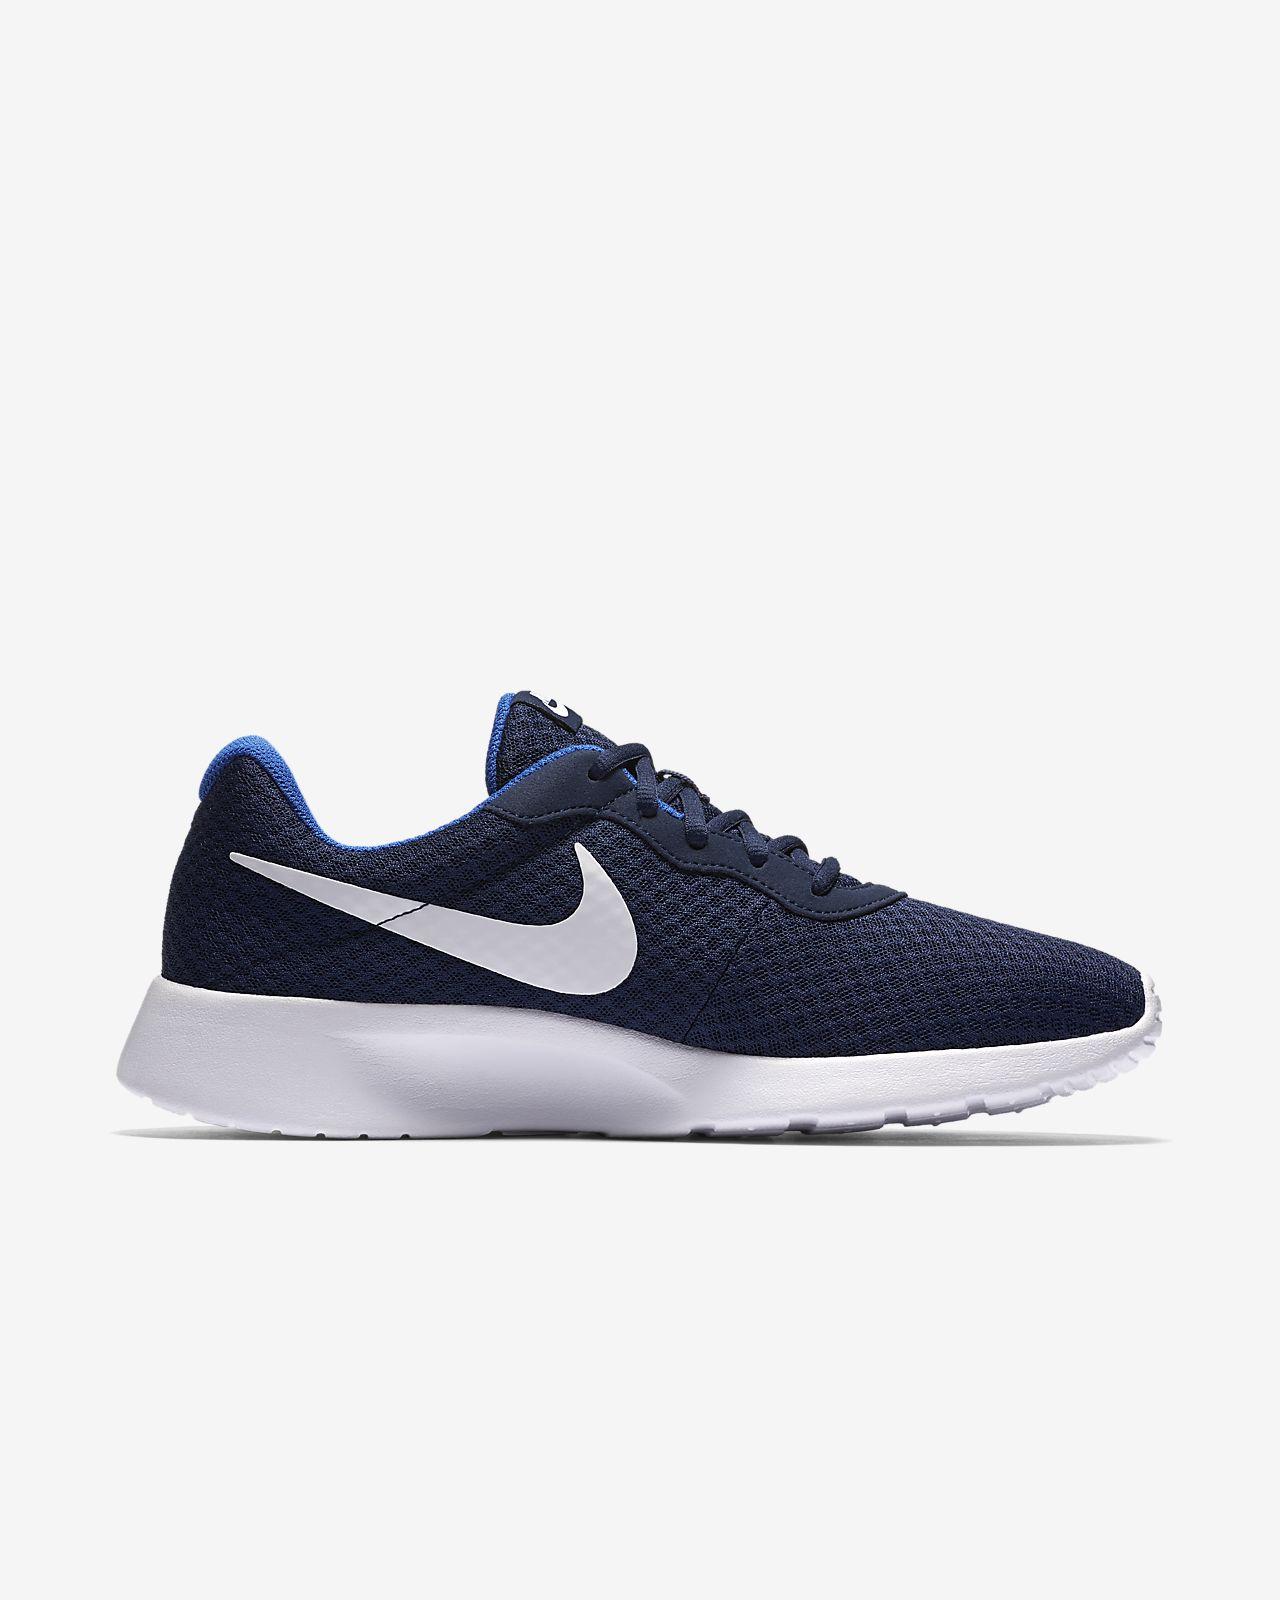 3e6299aad801 Low Resolution Nike Tanjun Men s Shoe Nike Tanjun Men s Shoe